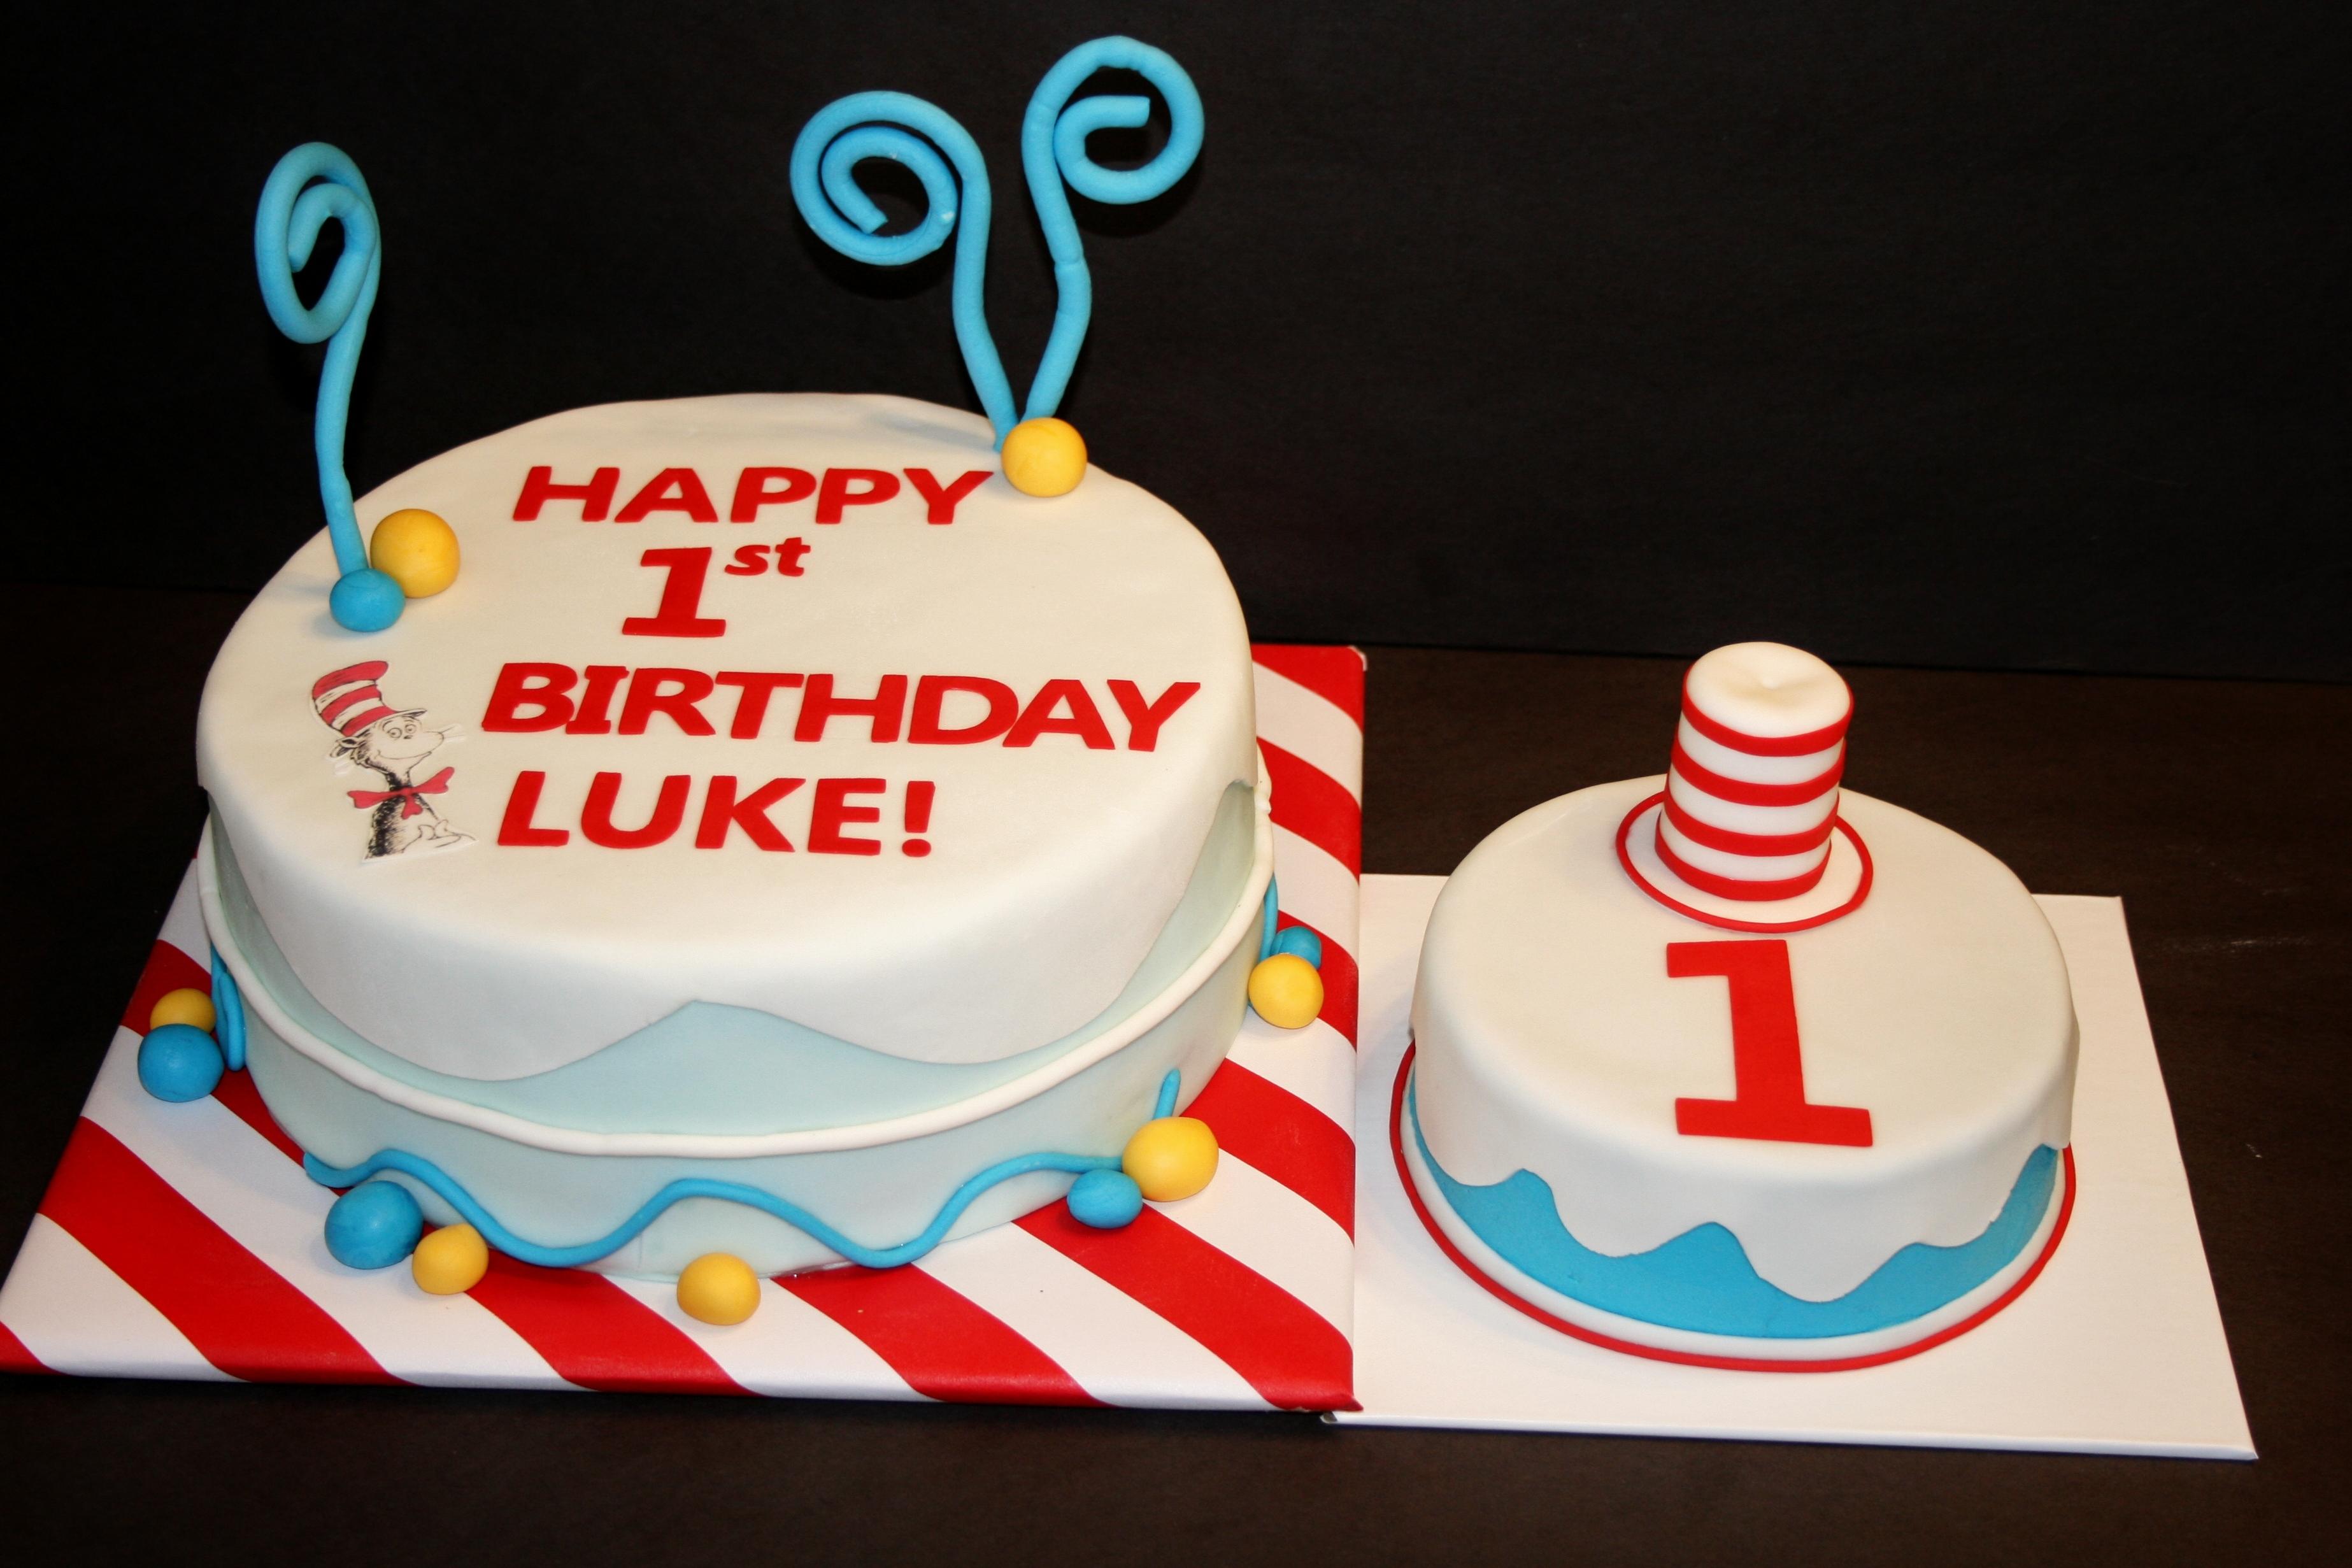 Dr Seuss Birthday Cake Finding Joy